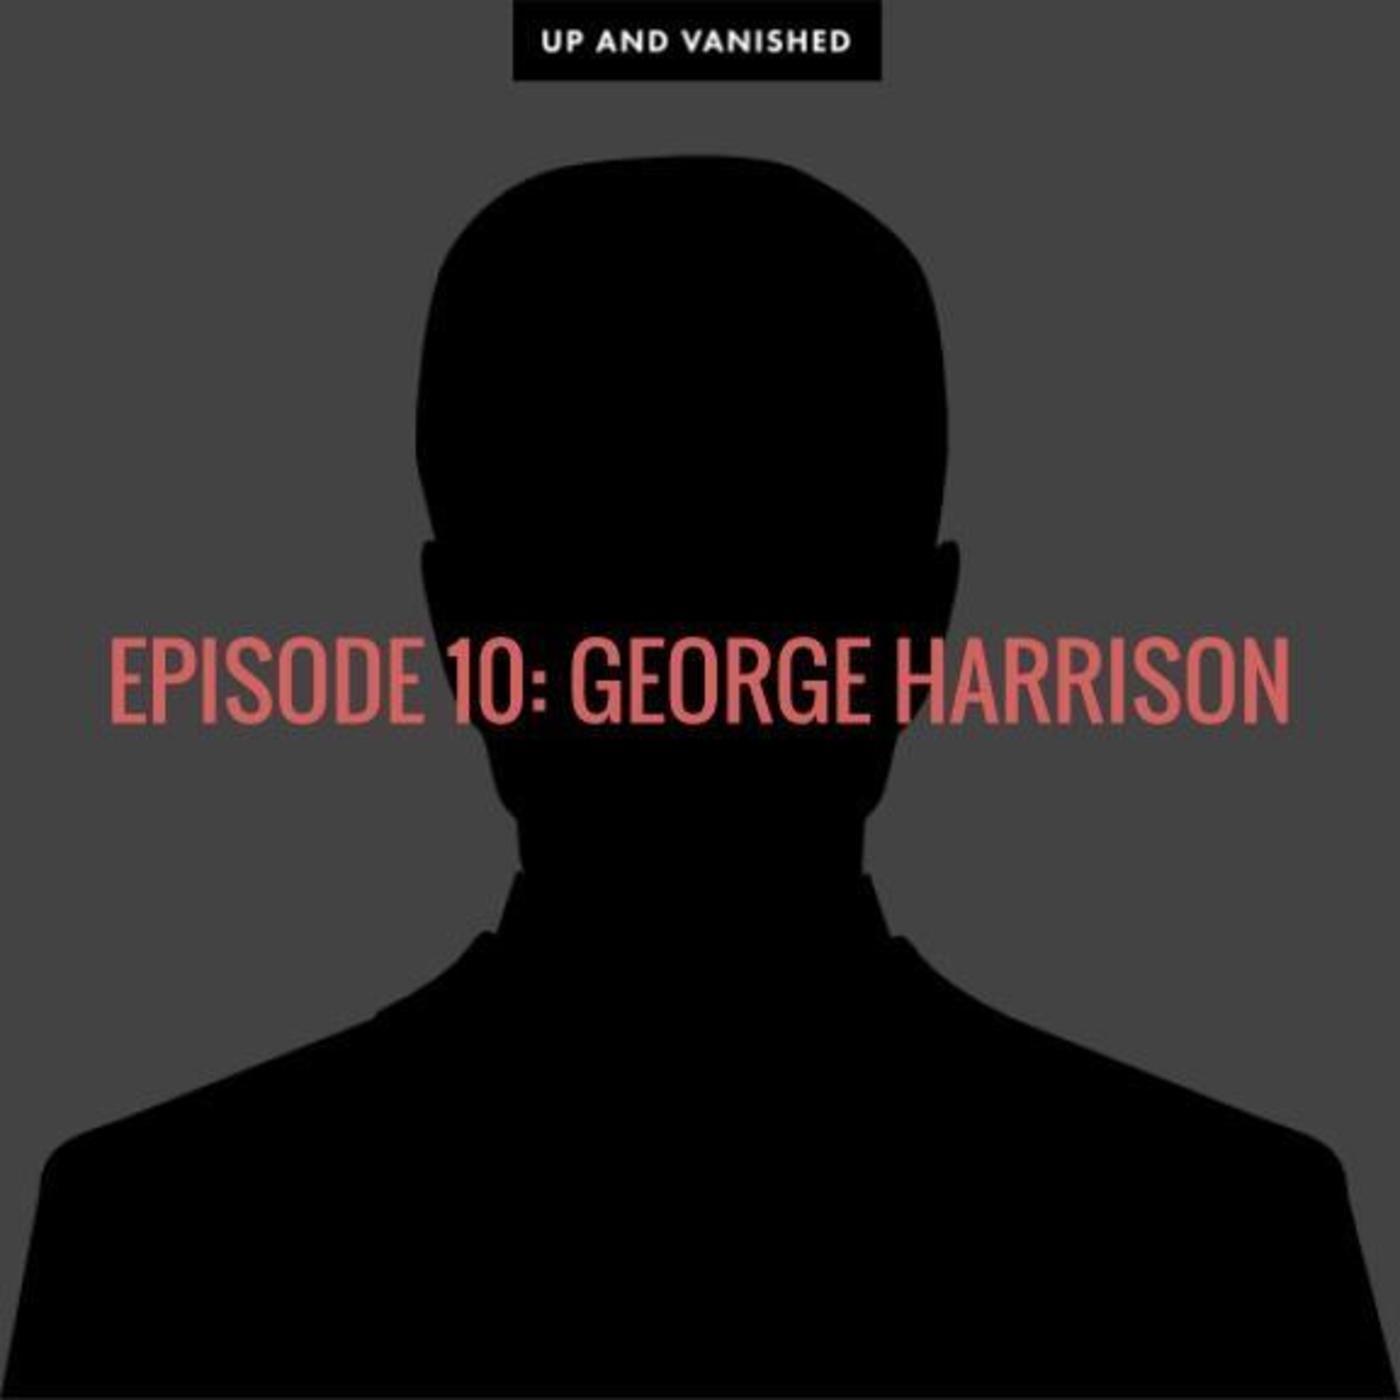 S1E10: George Harrison